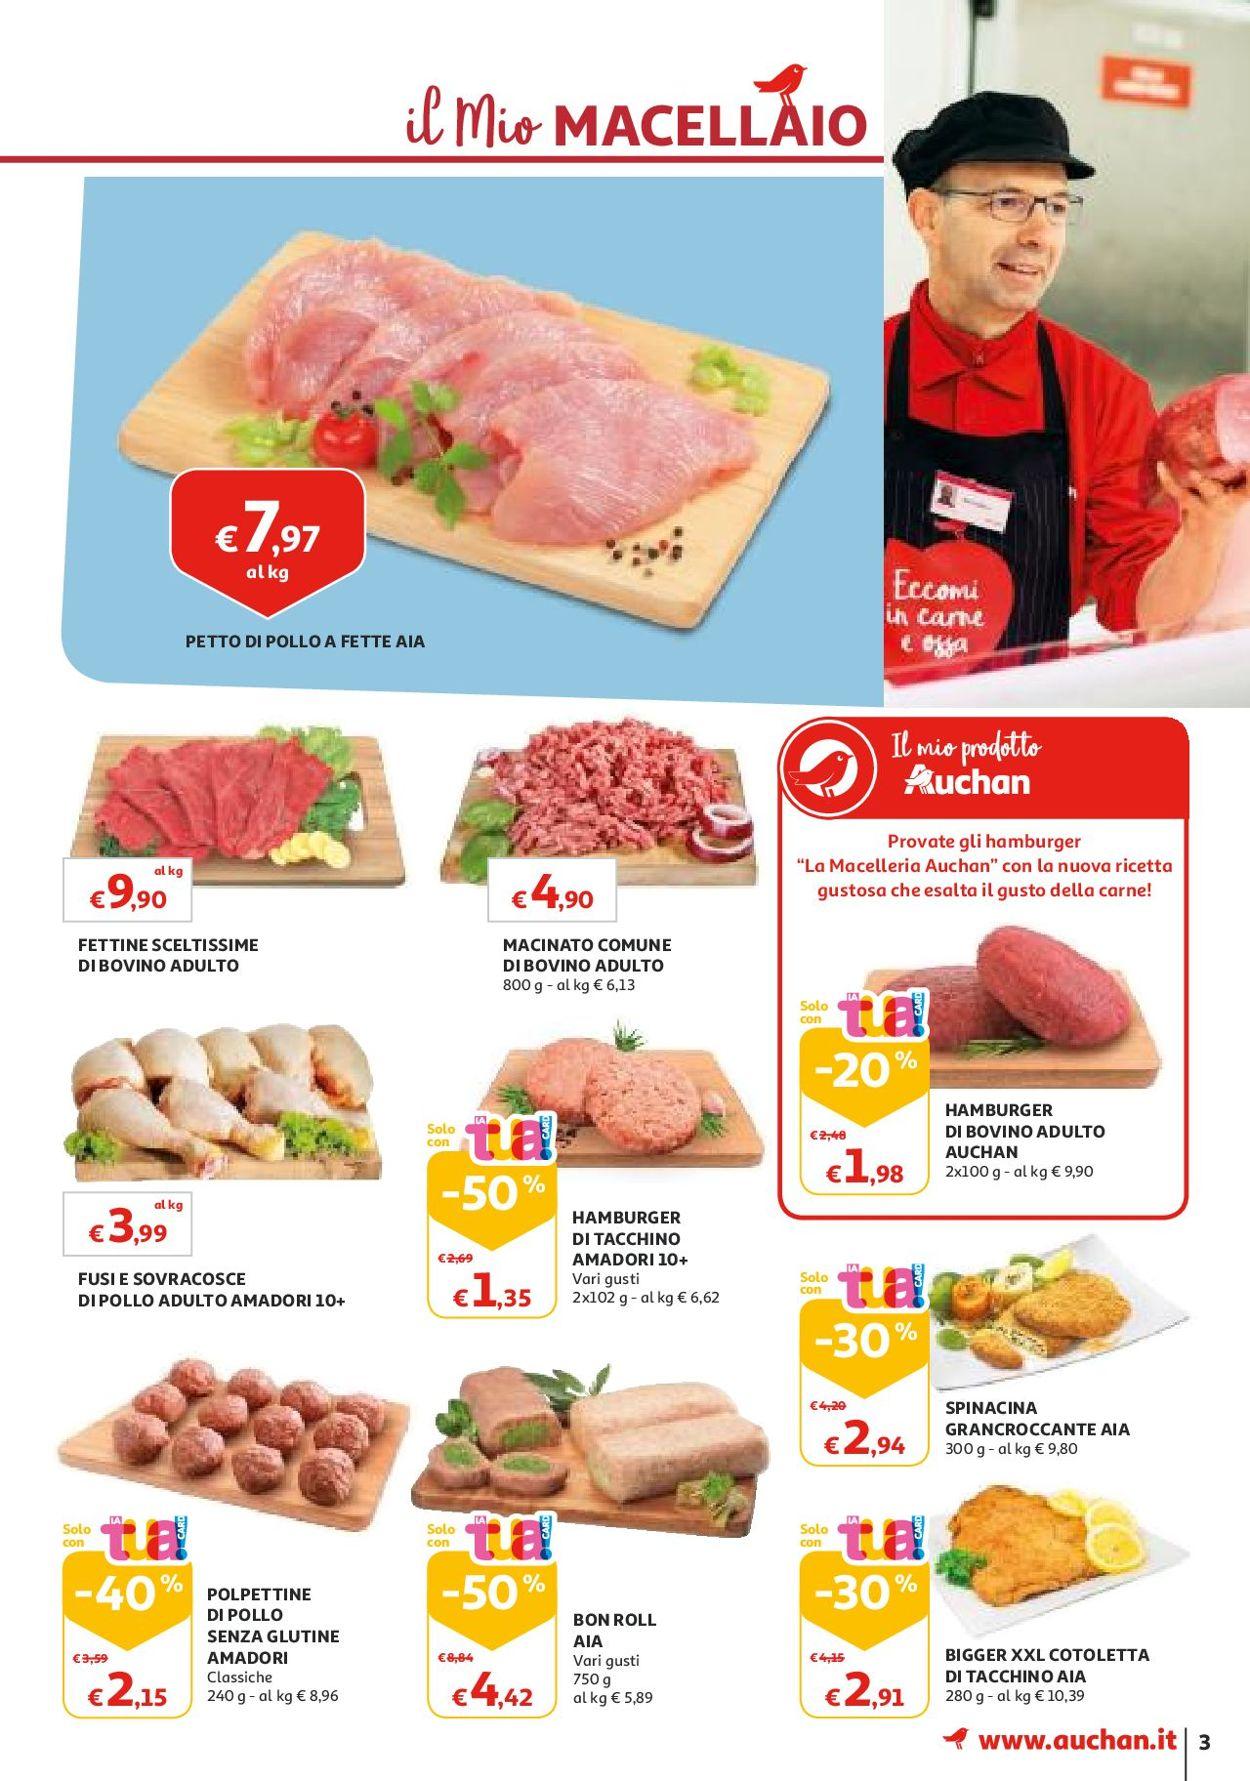 Volantino Auchan - Offerte 23/05-30/05/2019 (Pagina 3)